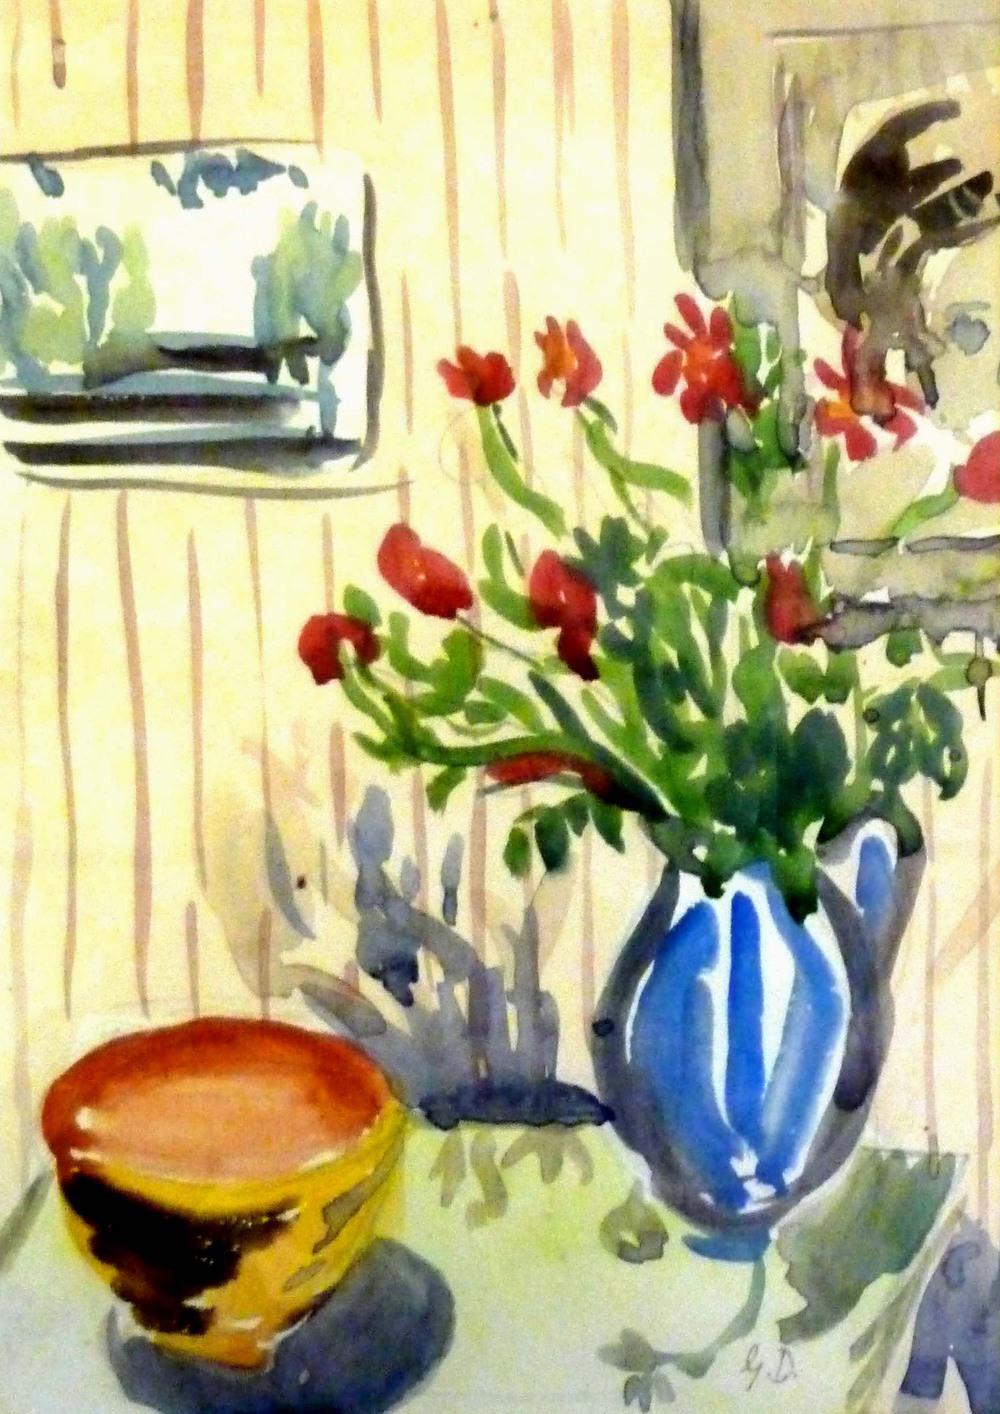 Gerard Dillon_-_Interior with Jug & Flowers.jpg